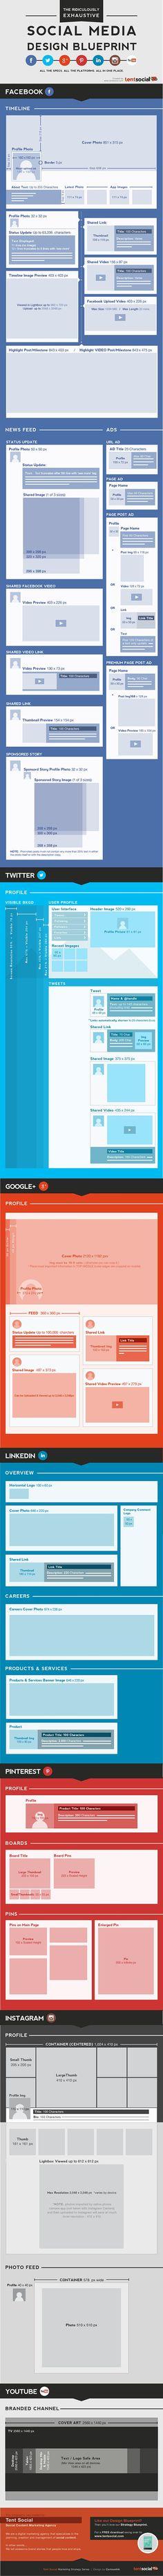 Social Media Design Blueprint Infographic   via #BornToBeSocial - Pinterest Marketing